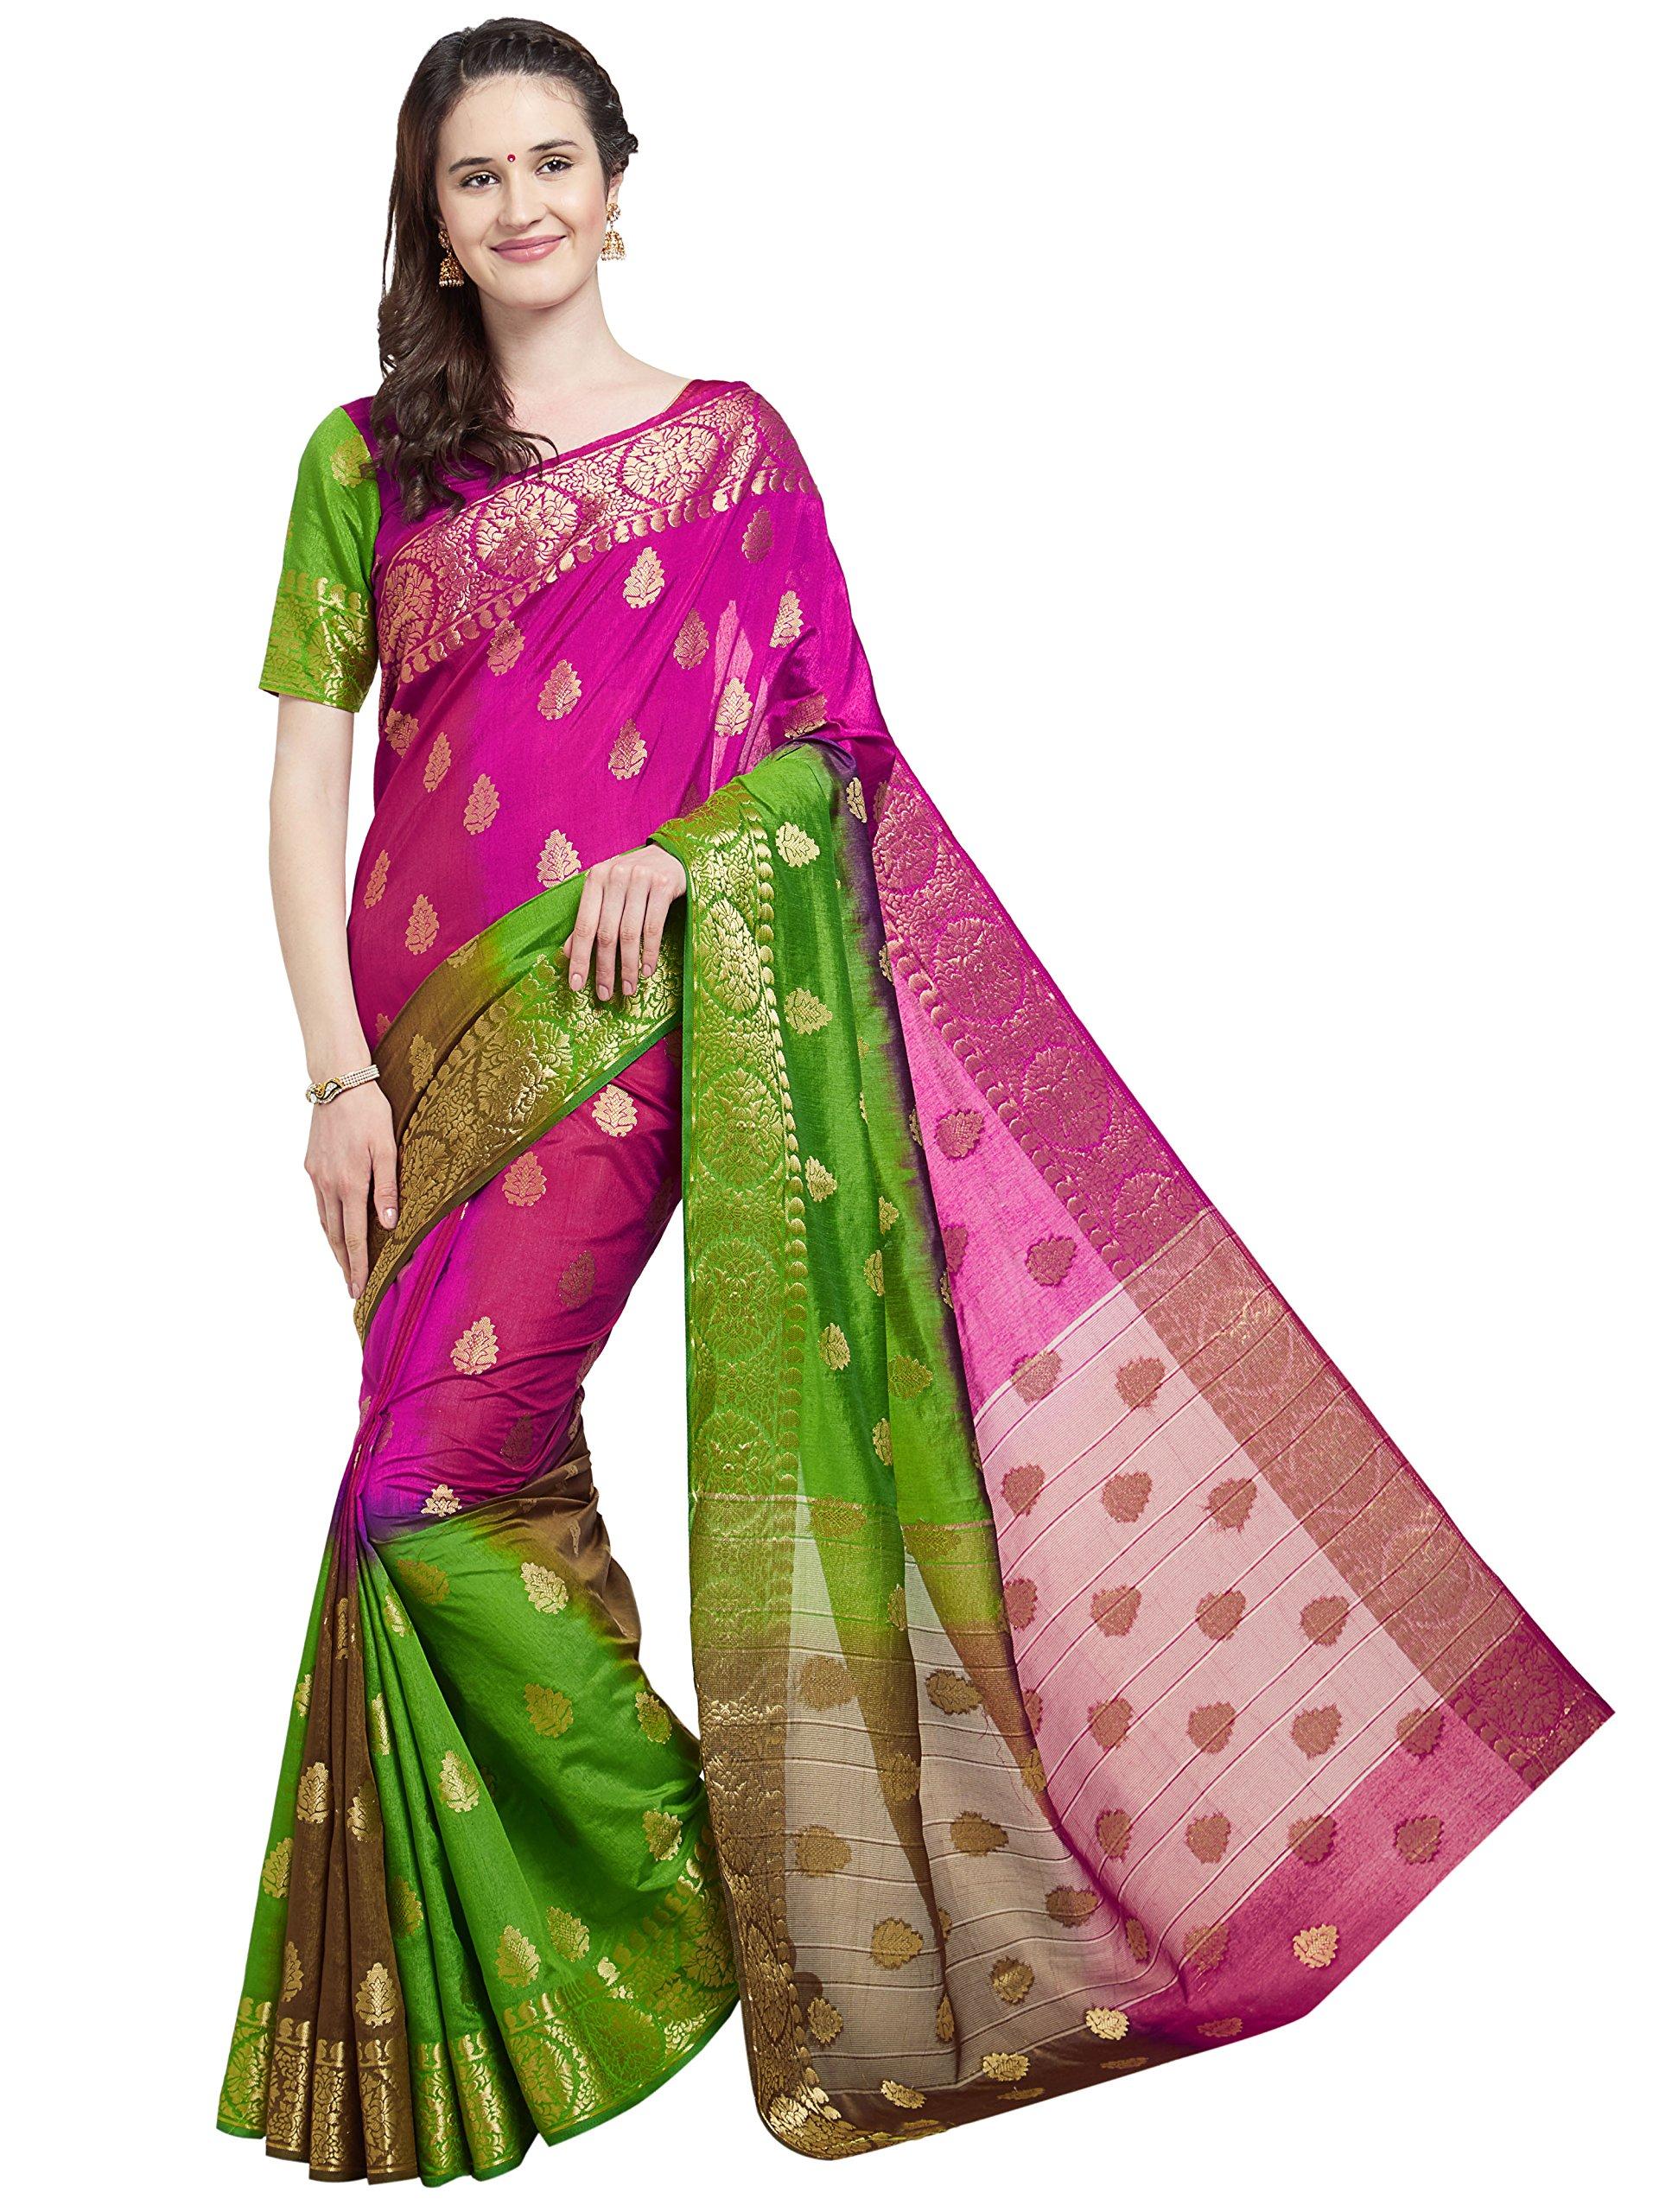 Viva N Diva Saree's for Women's Dark Pink & Green Color Banarasi Art Silk Saree with Unstitched Blouse Piece,Free Size